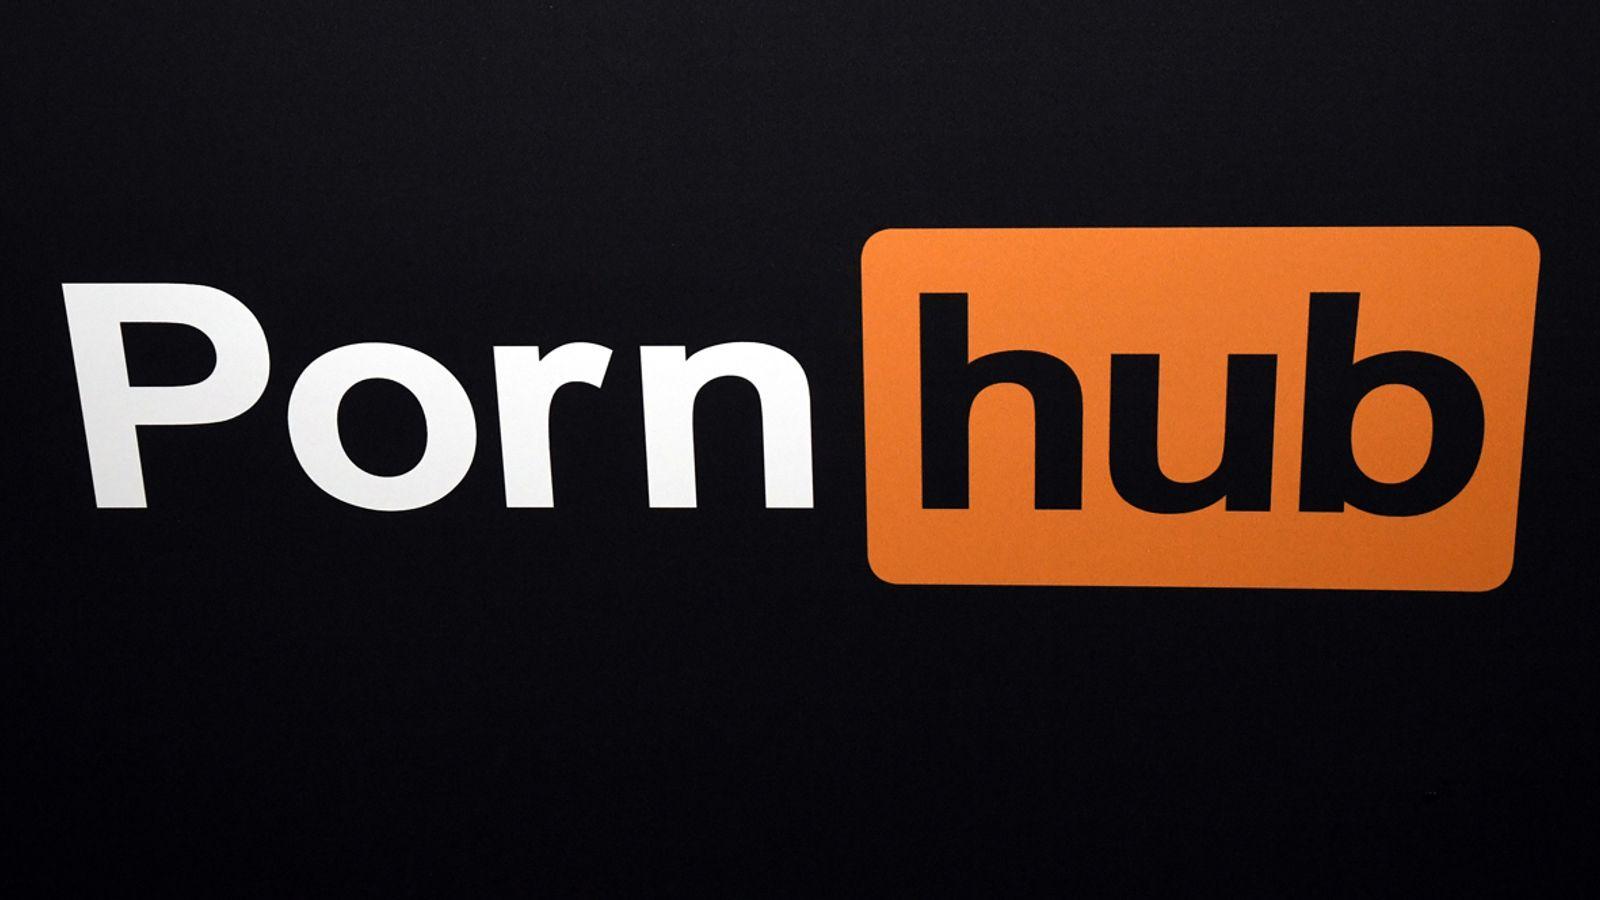 Dozens of women sue Pornhub - alleging explicit videos were uploaded without their consent